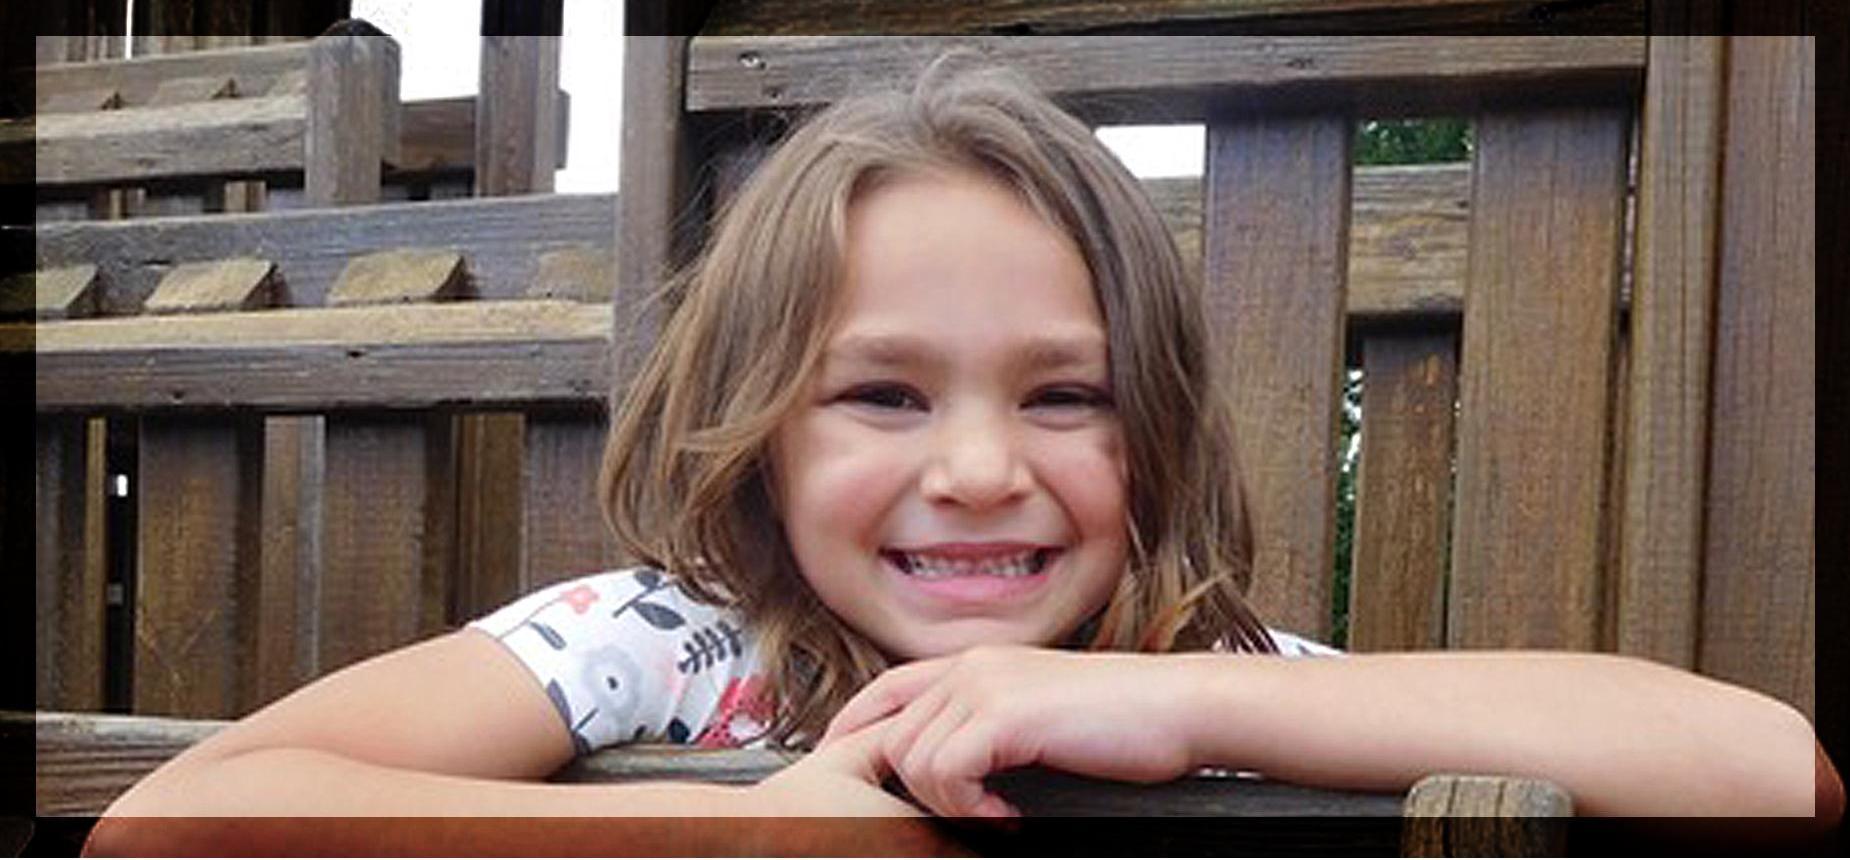 Elementary student on playground smiling